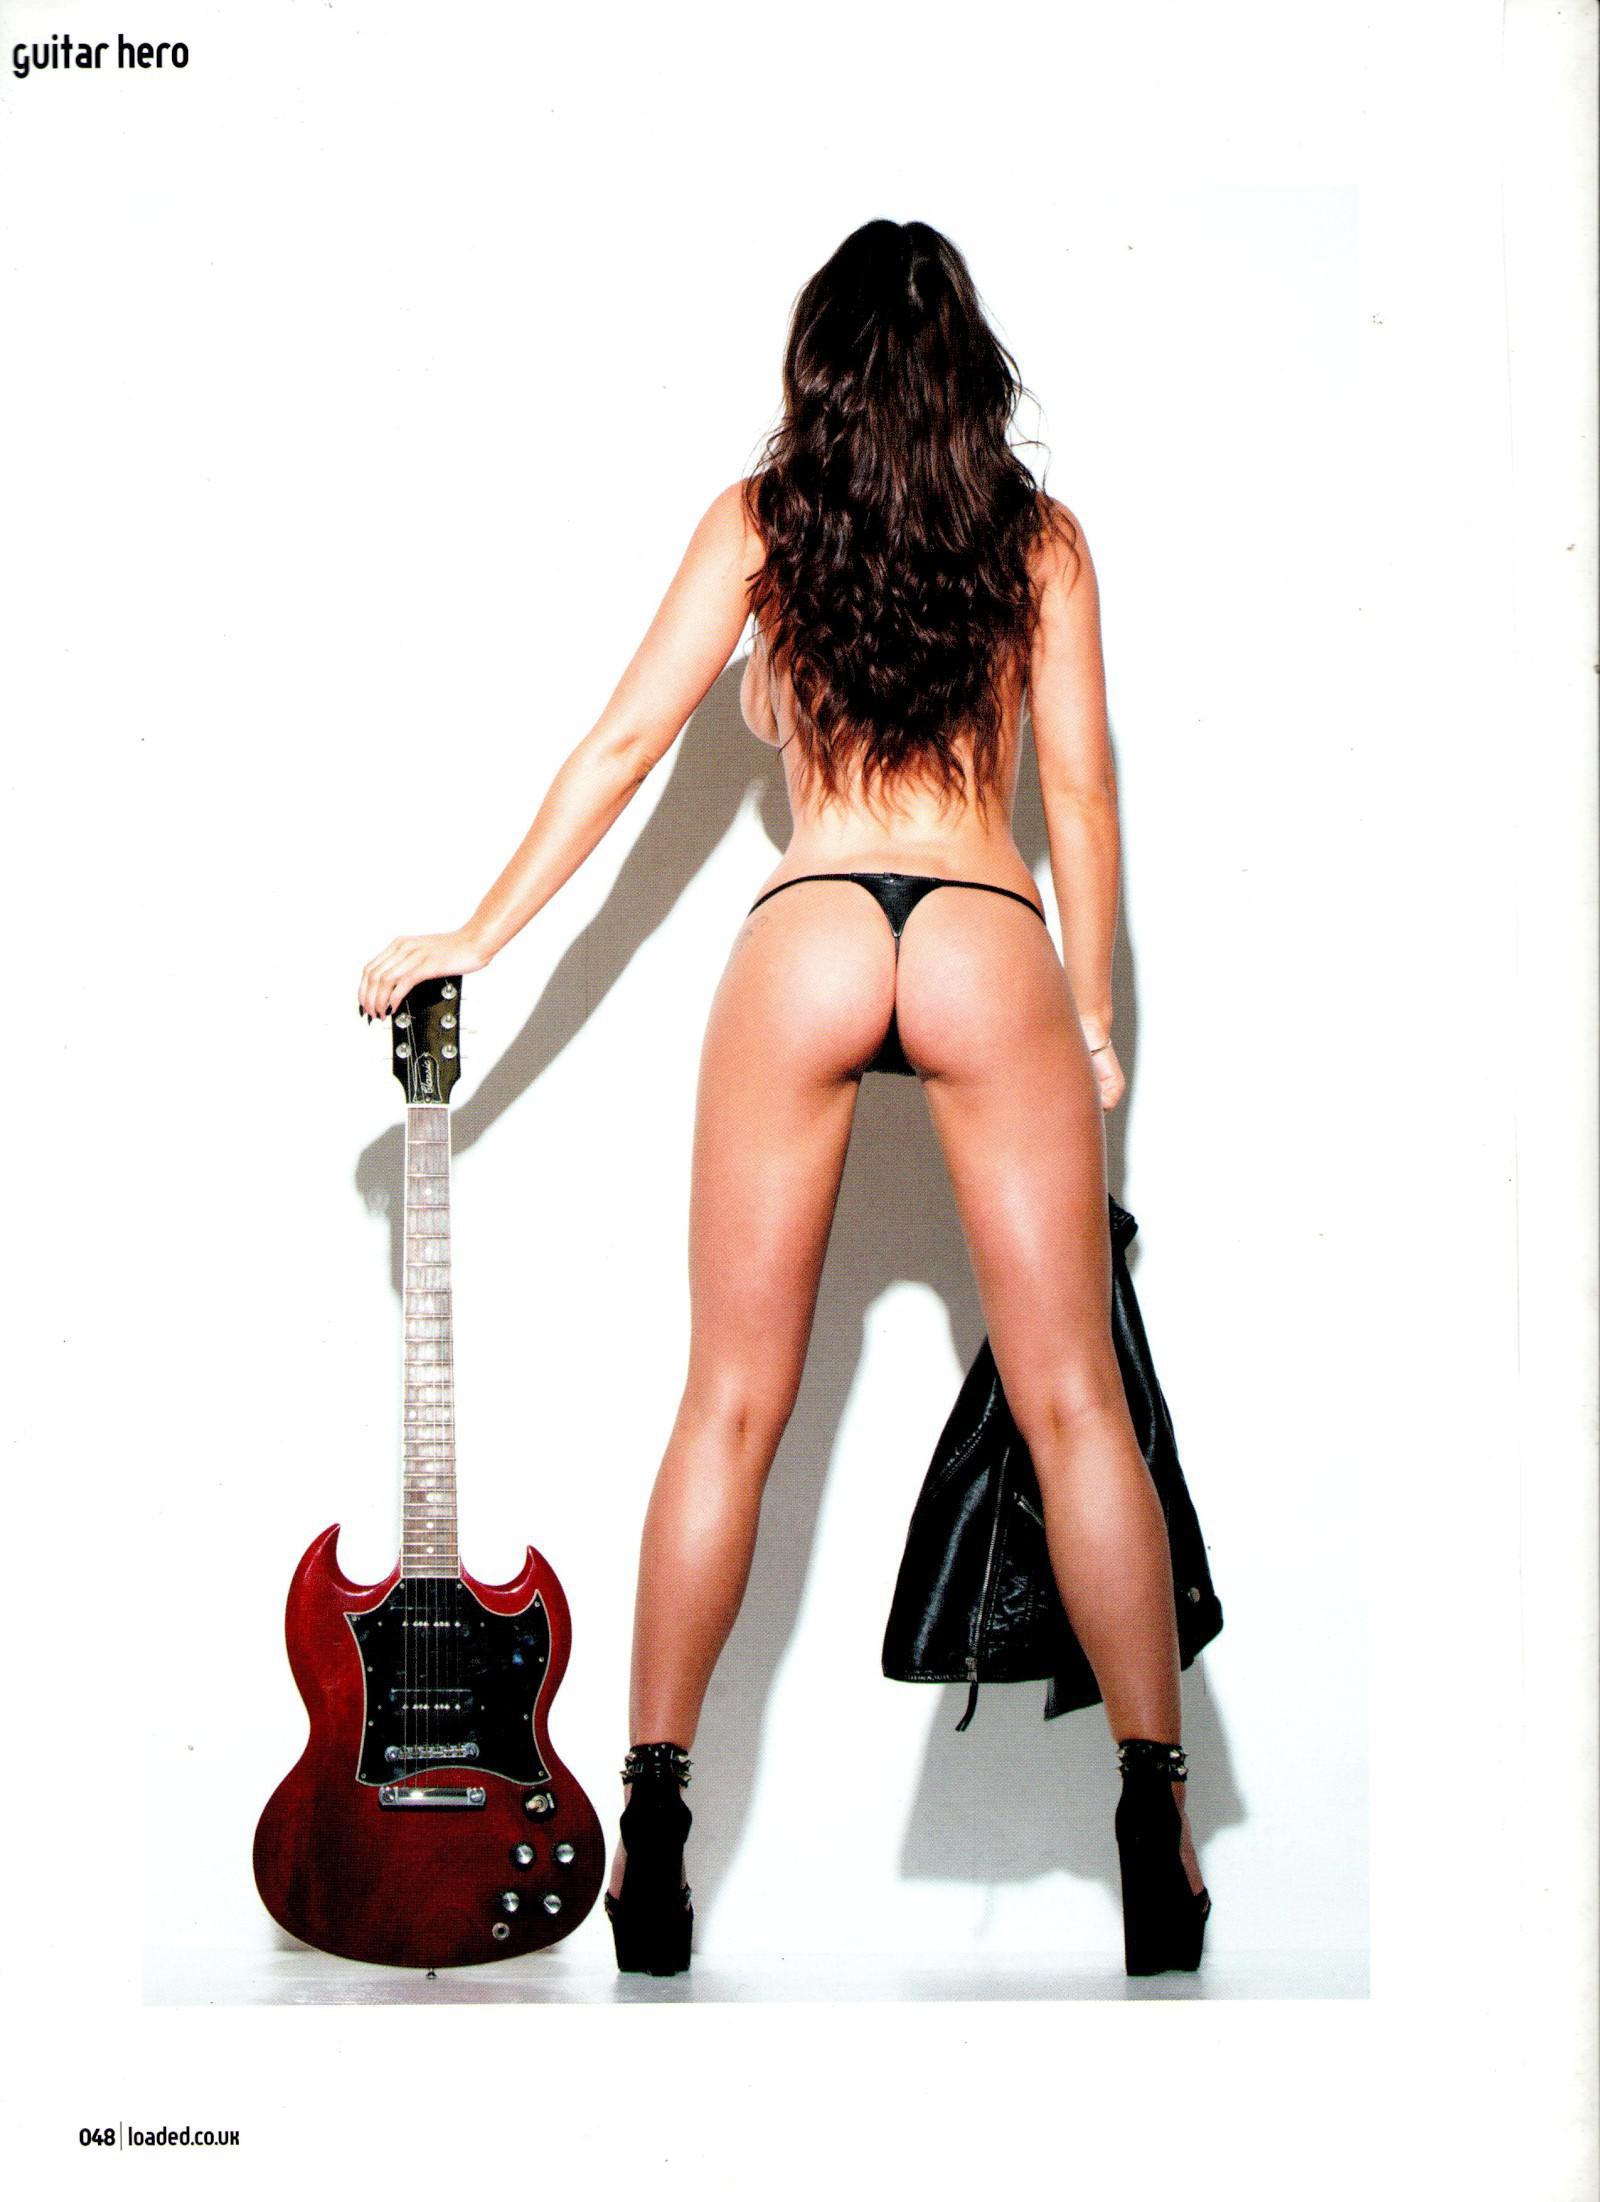 Guitar hero nude putch nudes gallery